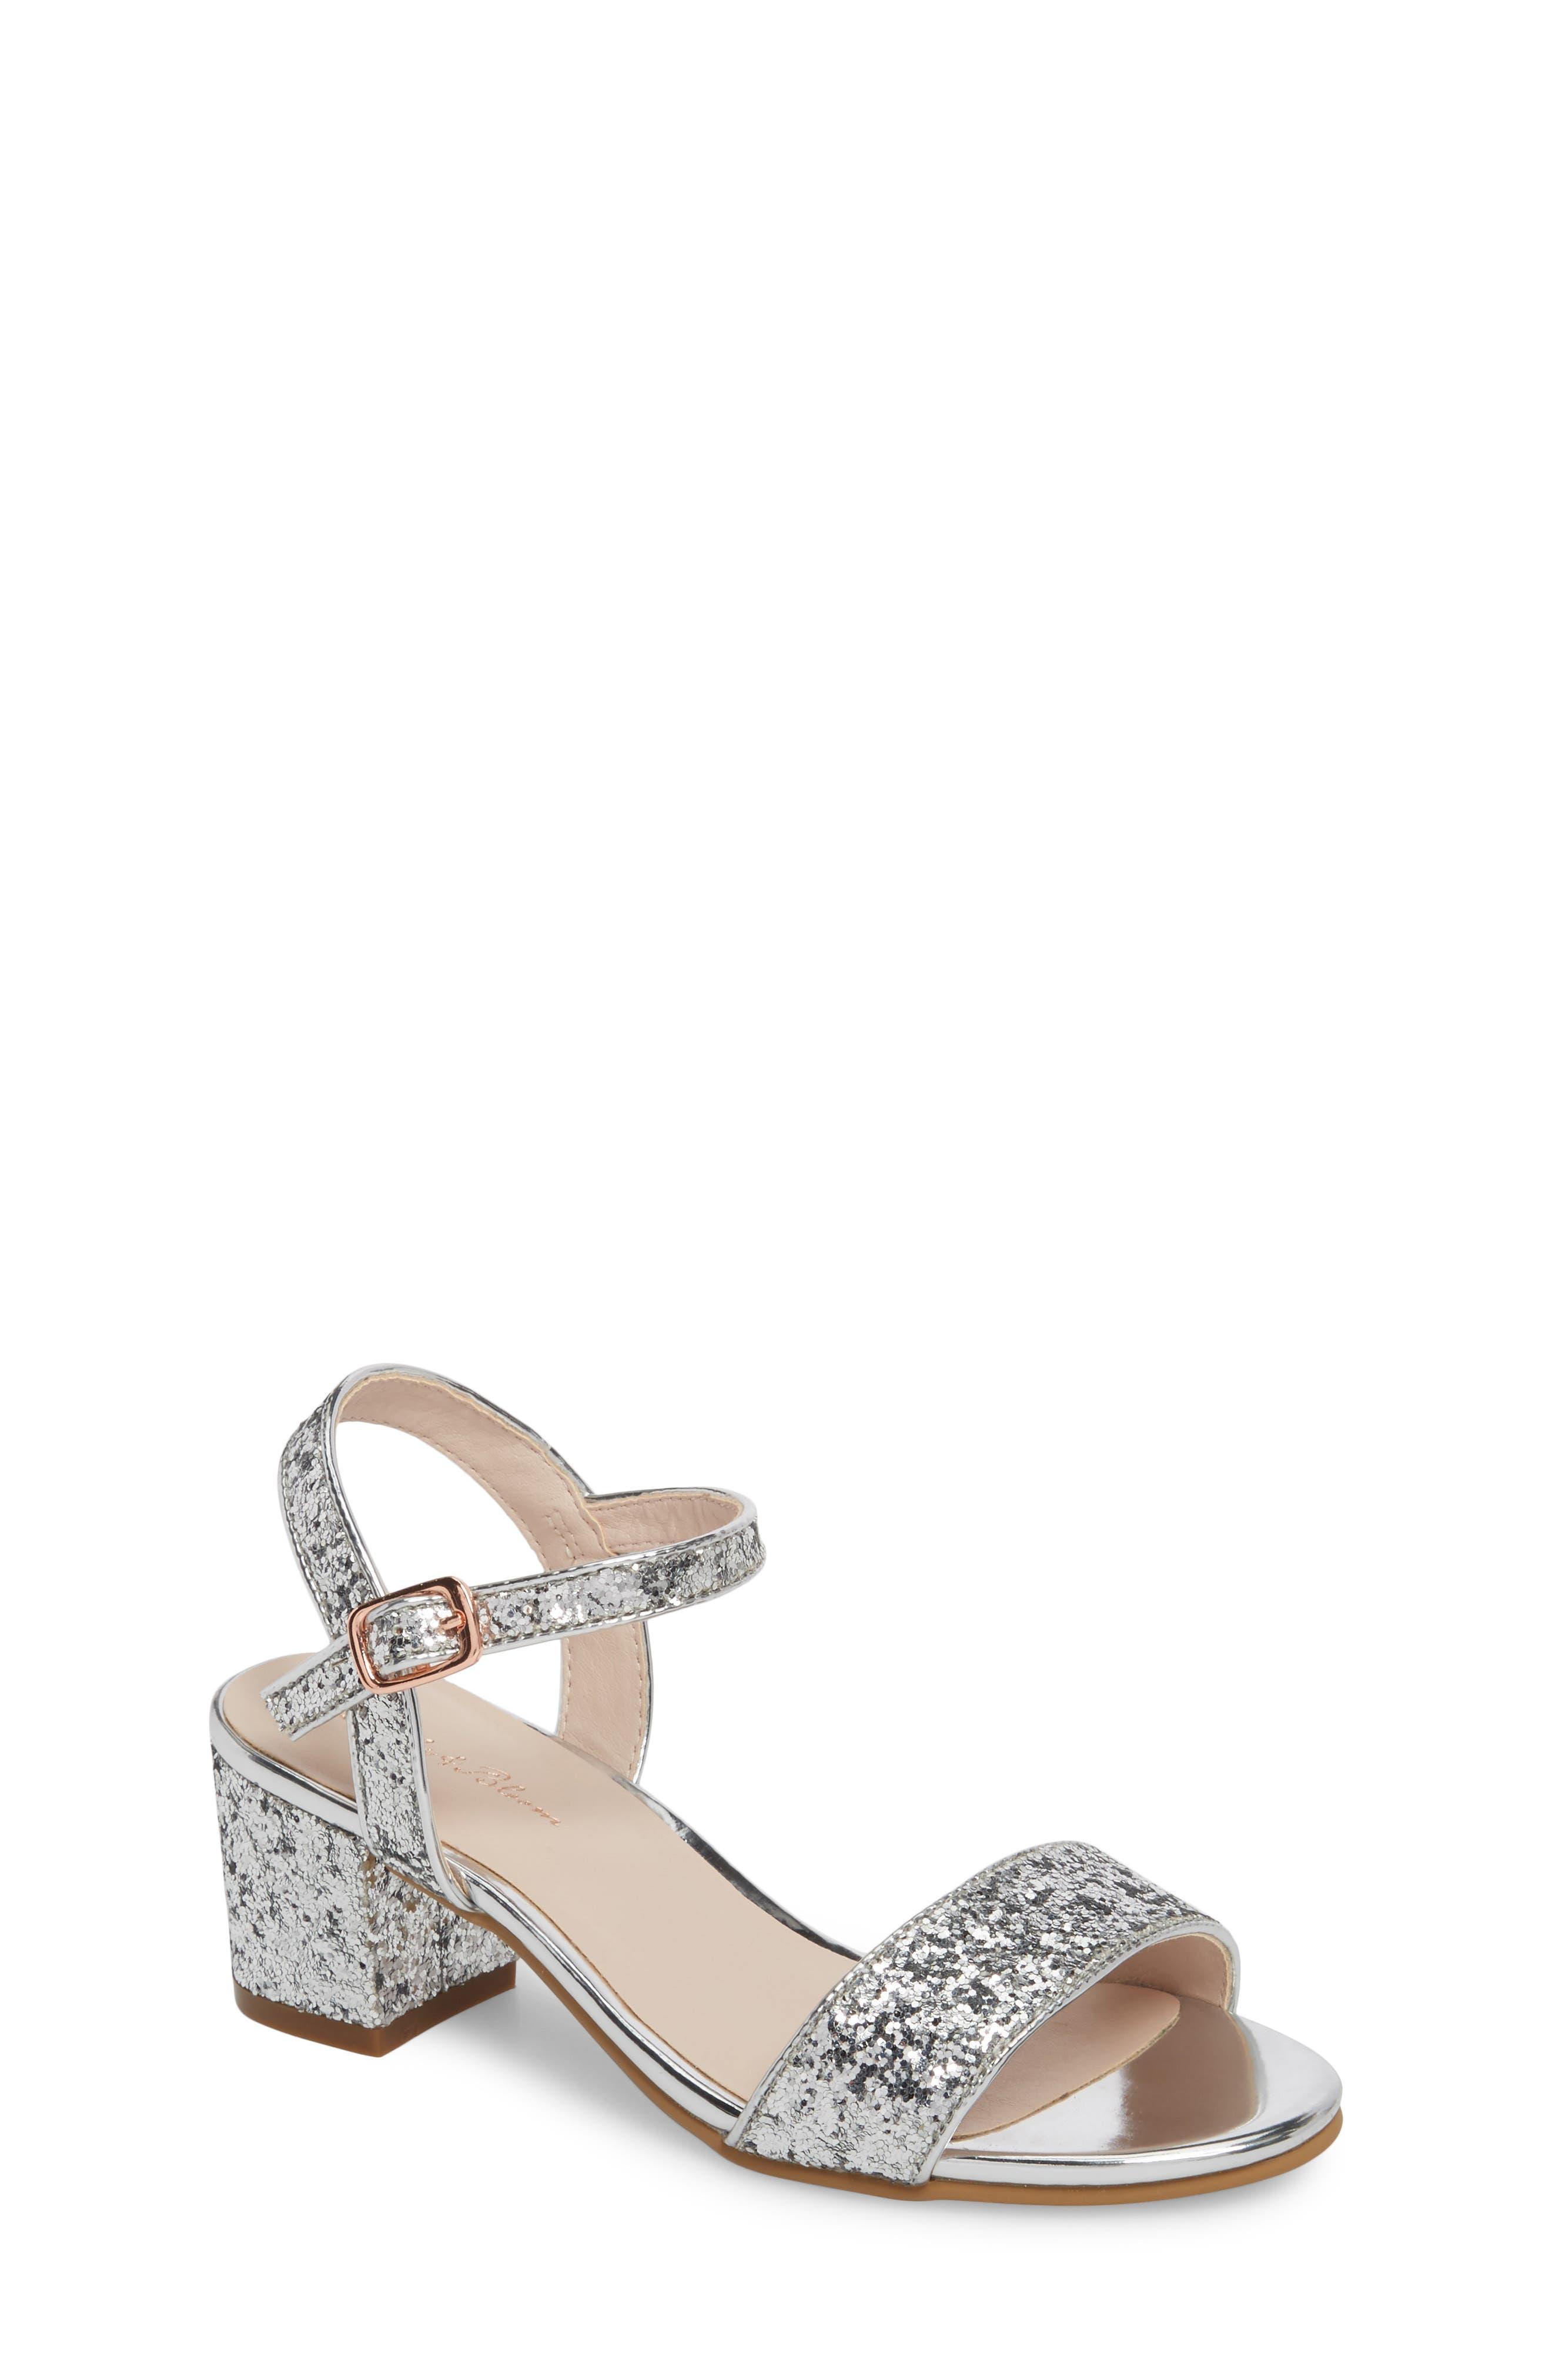 Danni Block Heel Sandal,                         Main,                         color, SILVER GLITTER